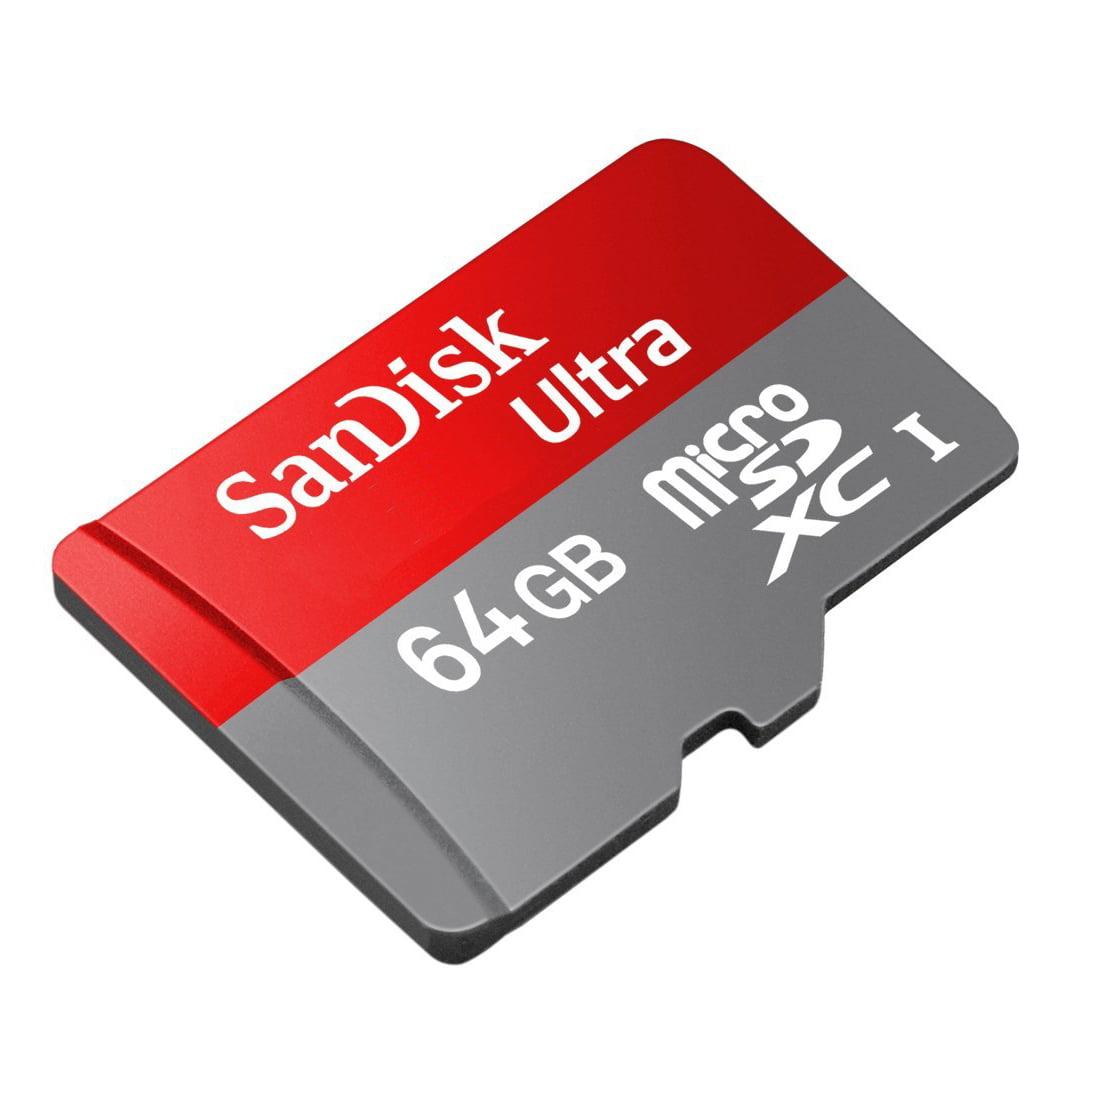 SanDisk Ultra 64GB Class 6 Camera & Cell Phone microSDXC Memory Card w/Adapter